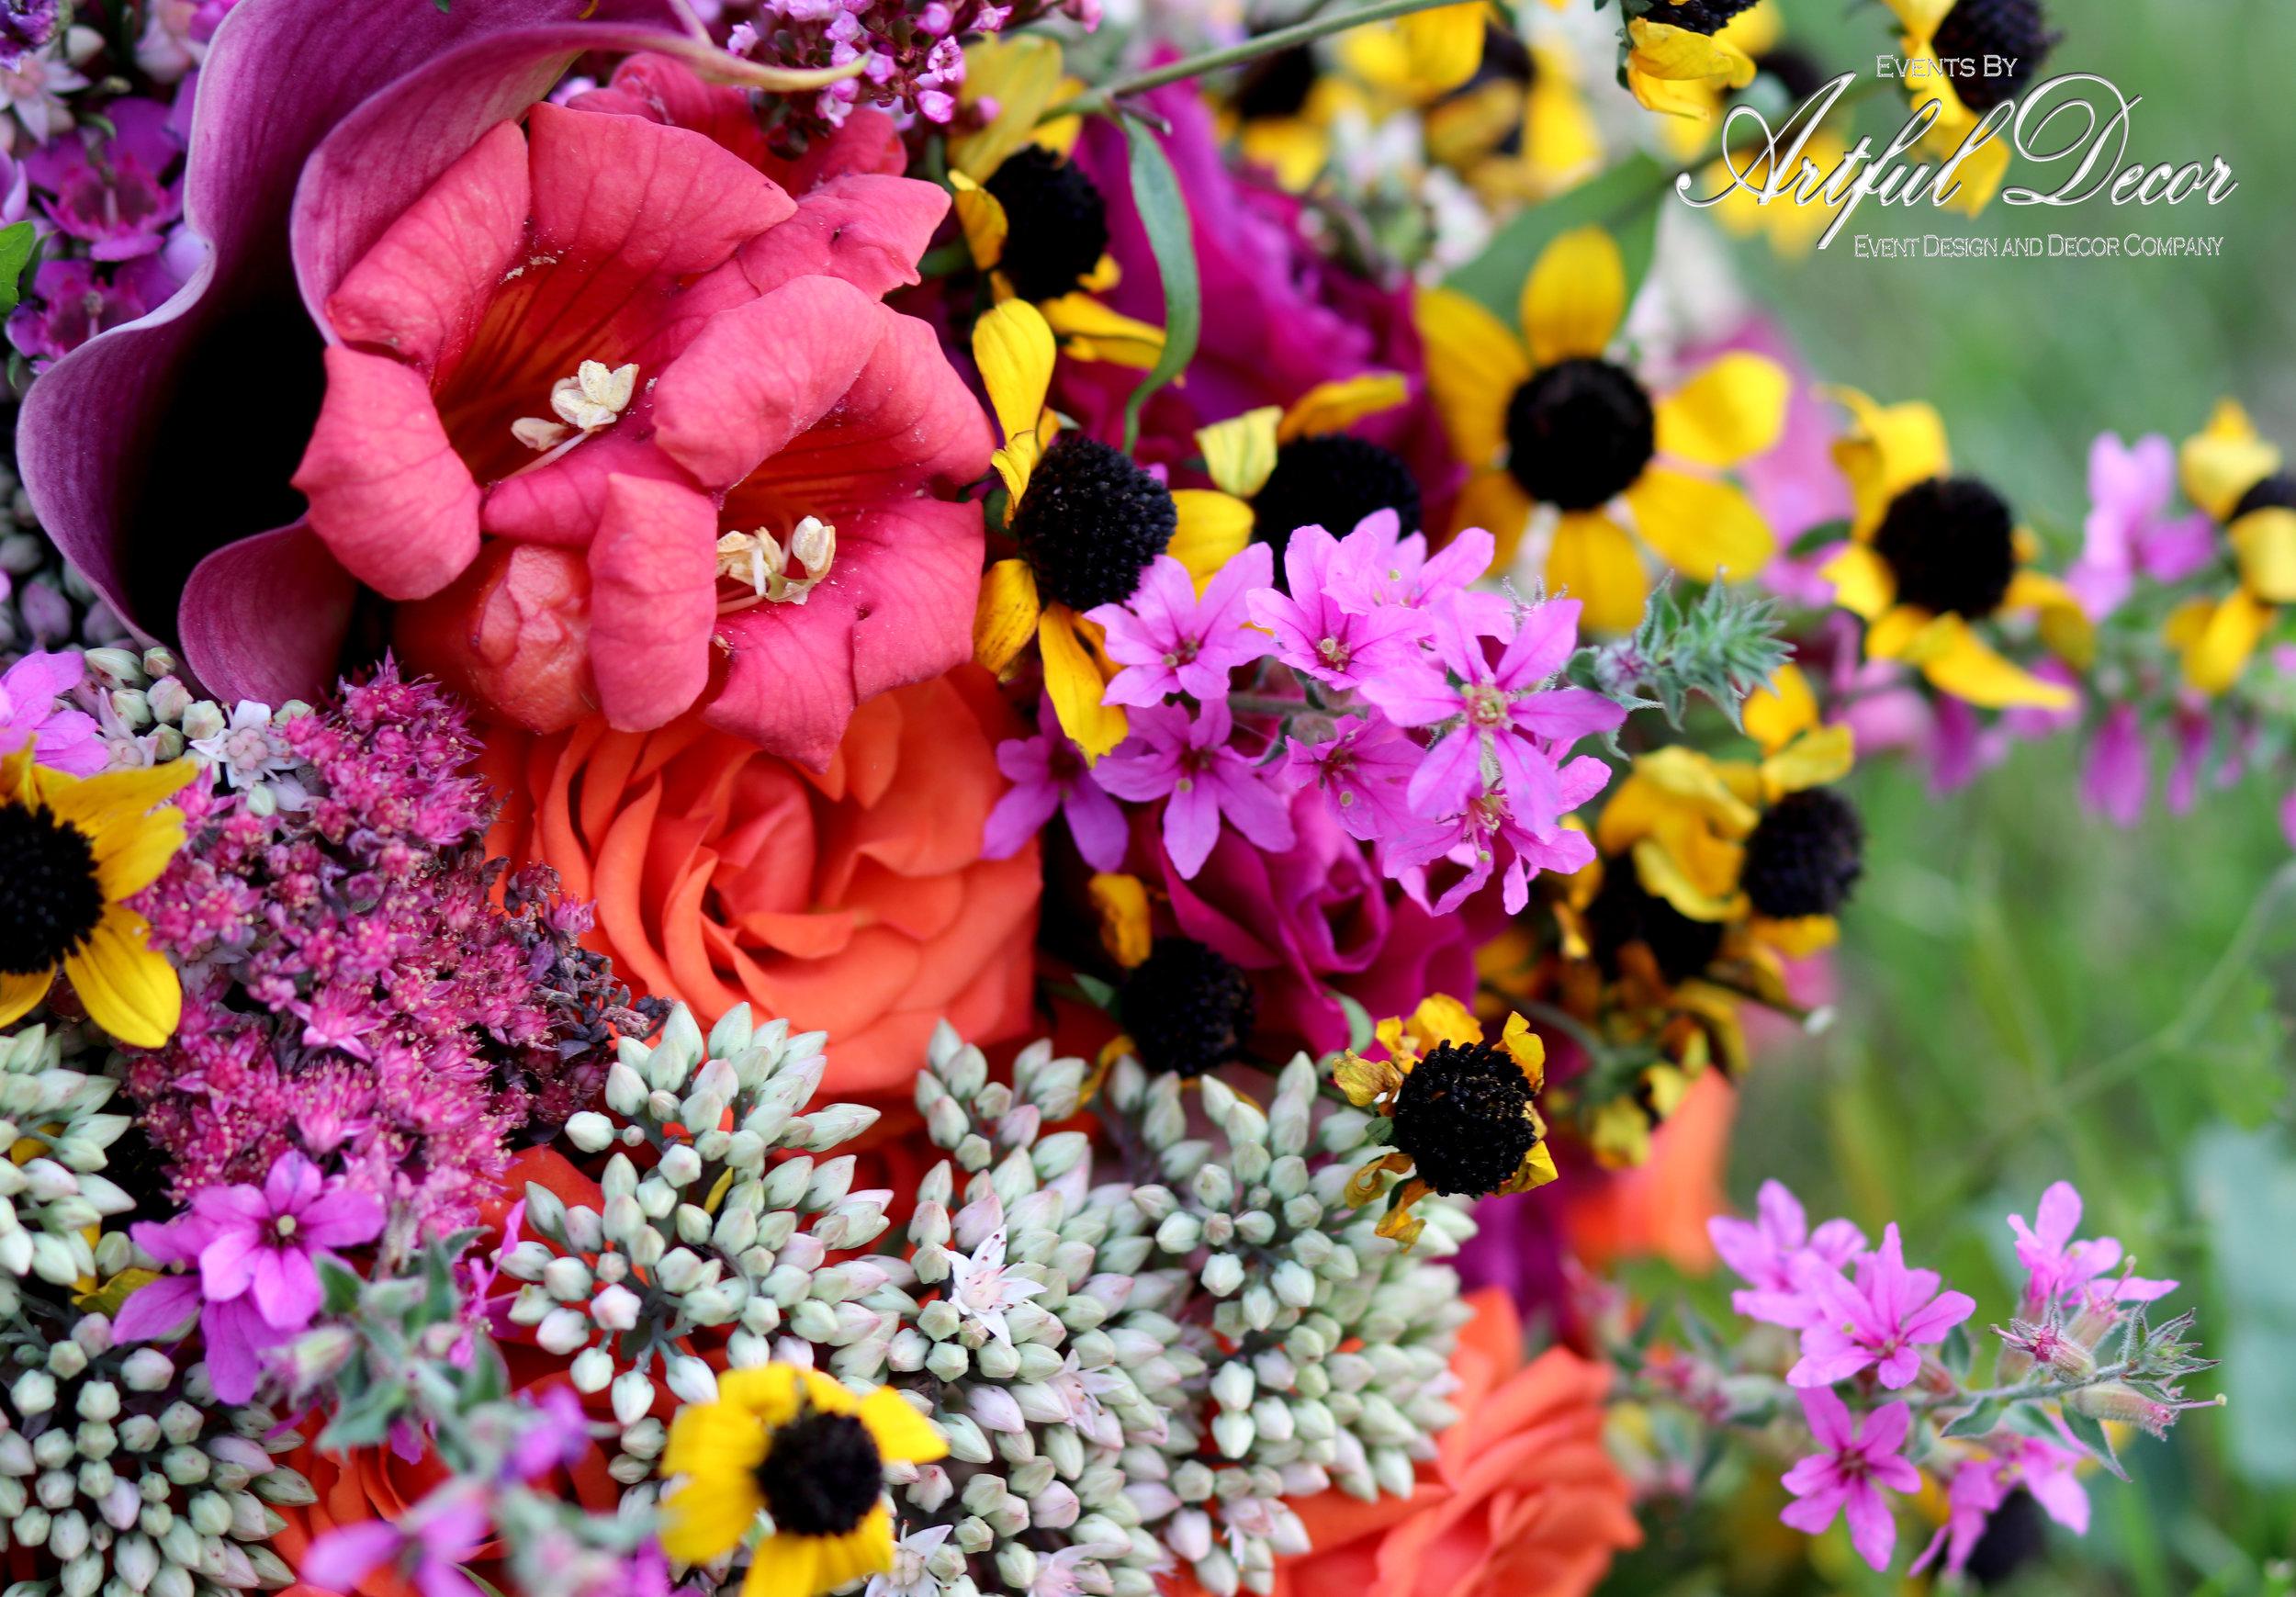 Bouquet 4 Crop Copyright.jpg